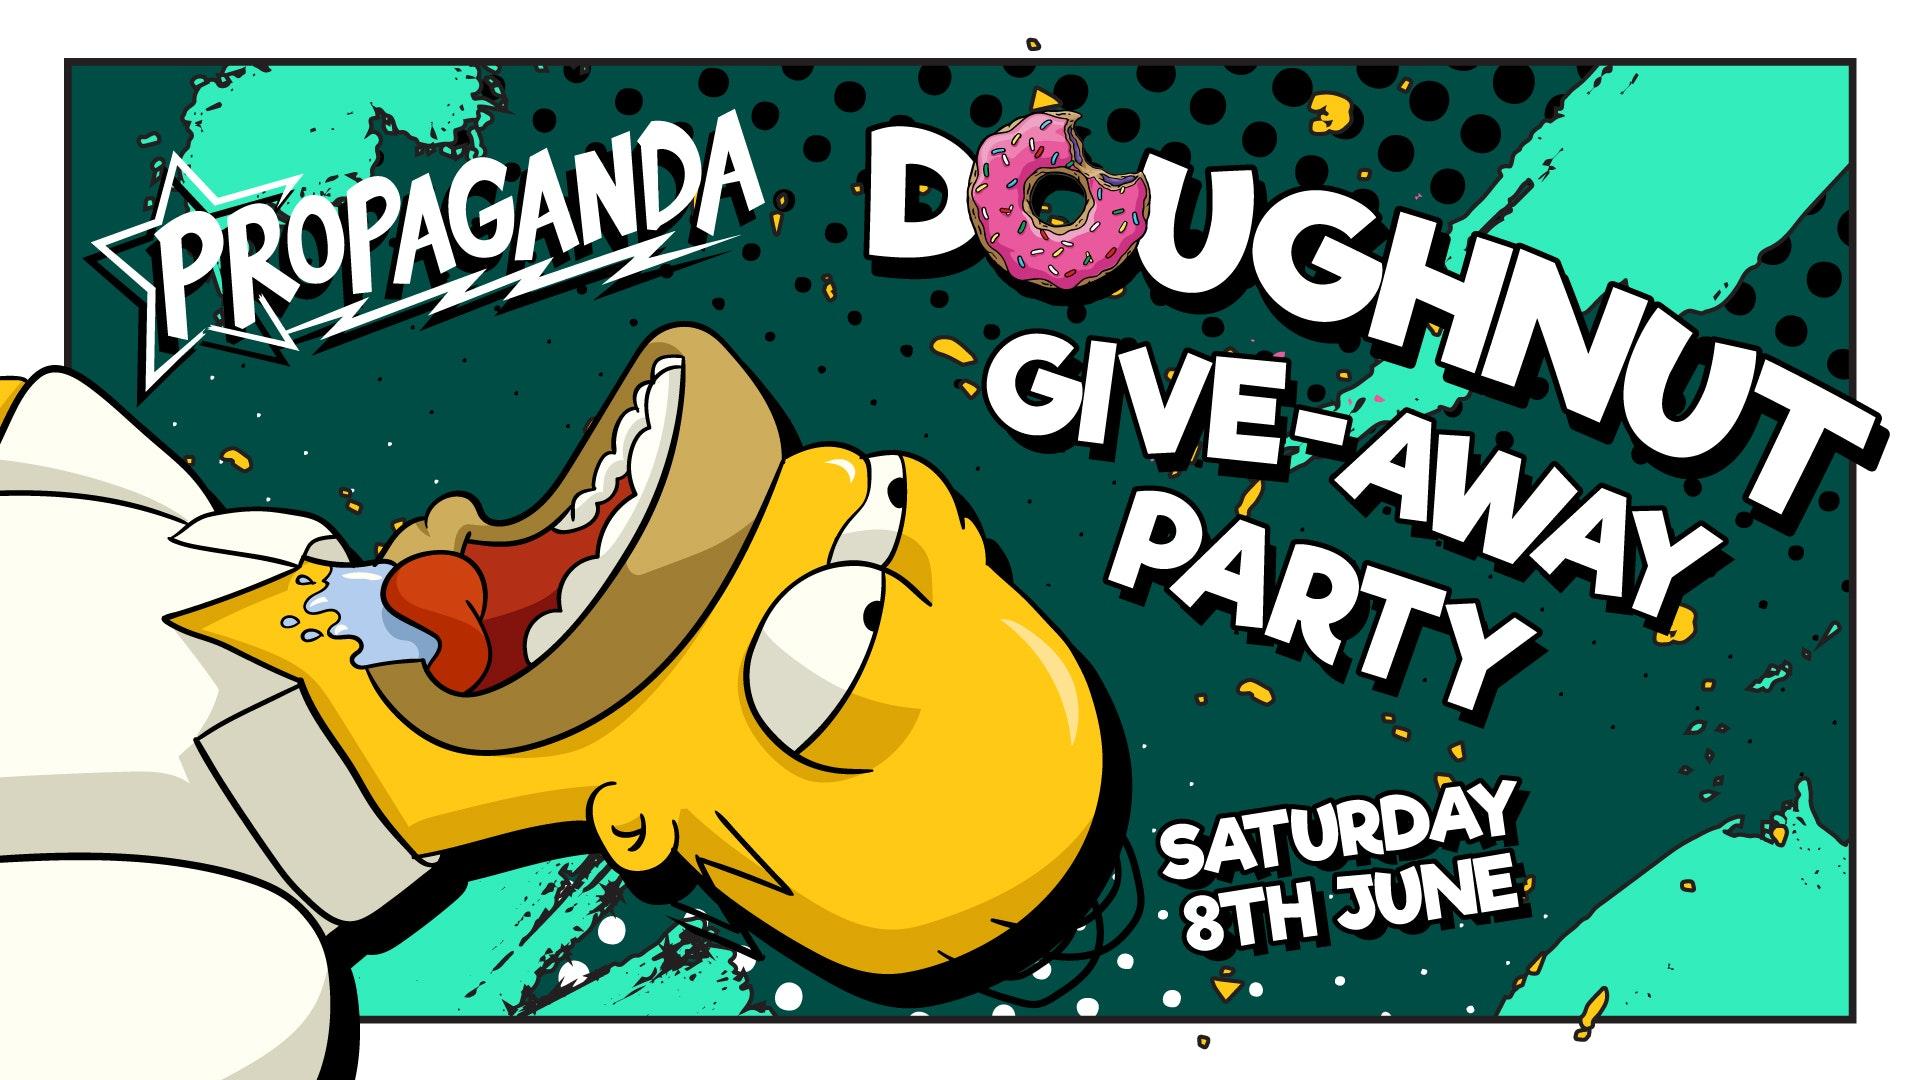 Propaganda Bristol – Doughnut Party